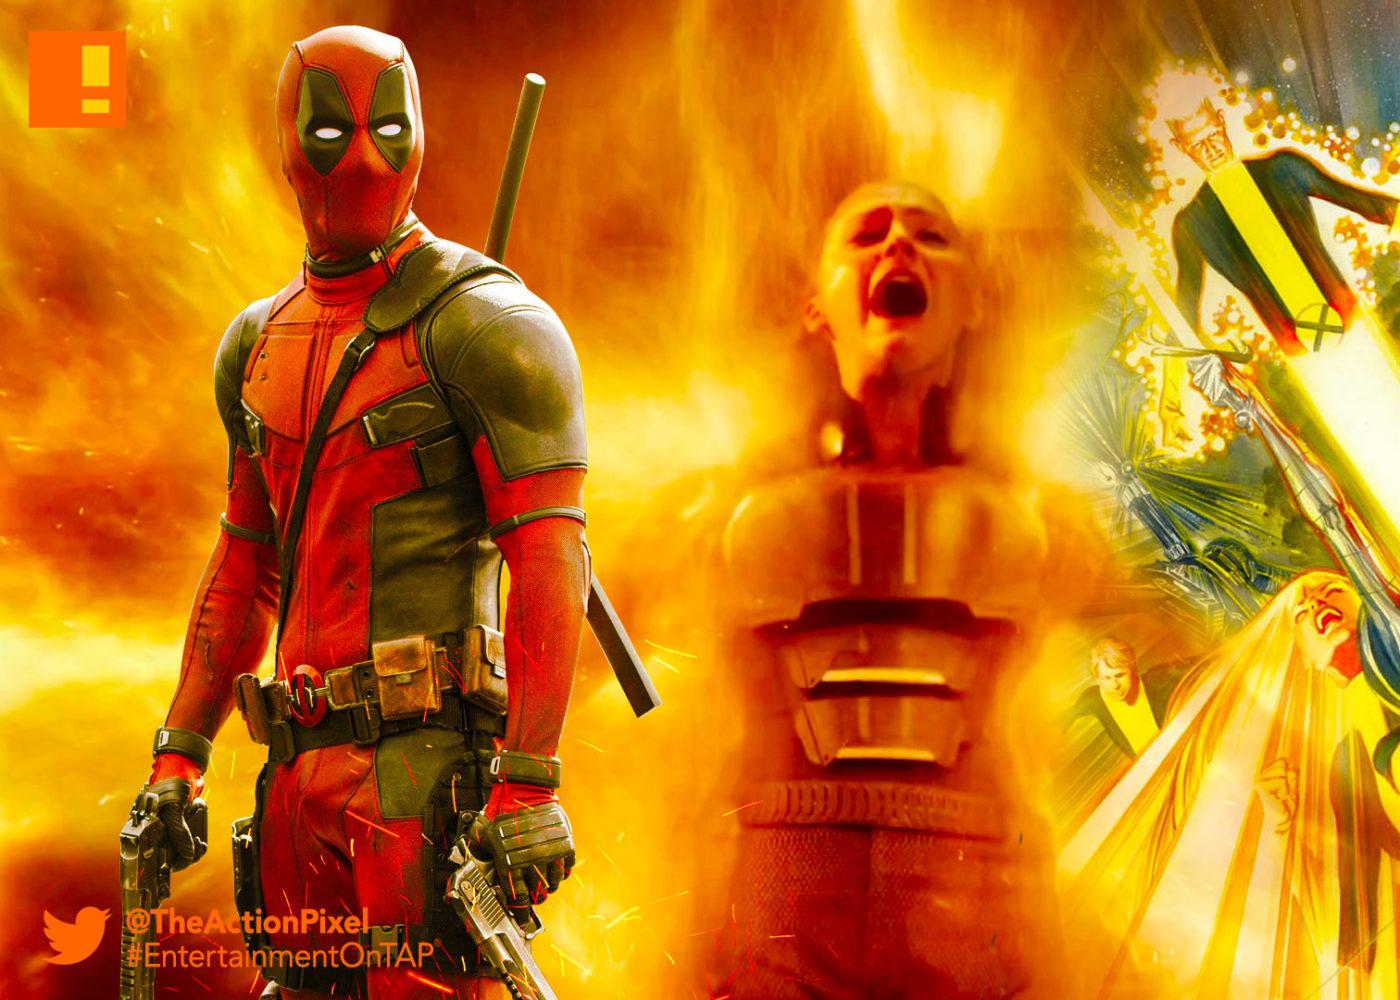 deadpool, dark phoenix, new mutants, fox, 20th century fox, marvel, x-men, entertainment on tap, the action pixel